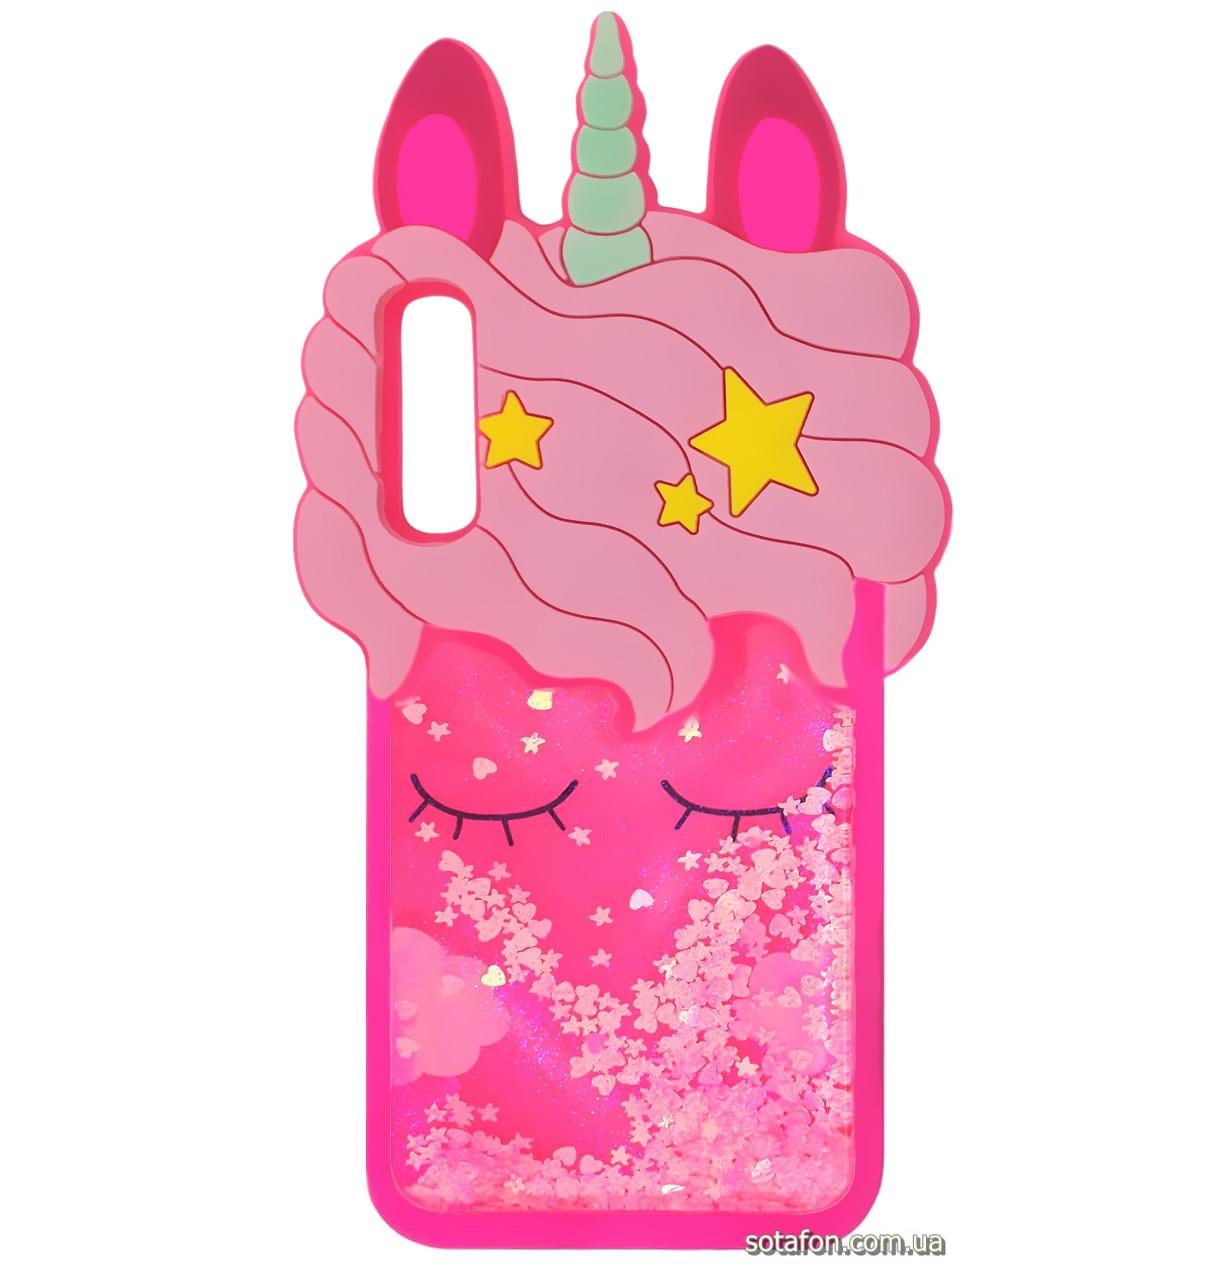 Чехол-накладка TPU 3D (Жидкий Блеск) Little Unicorn для Samsung Galaxy A50 (2019) SM-A505F